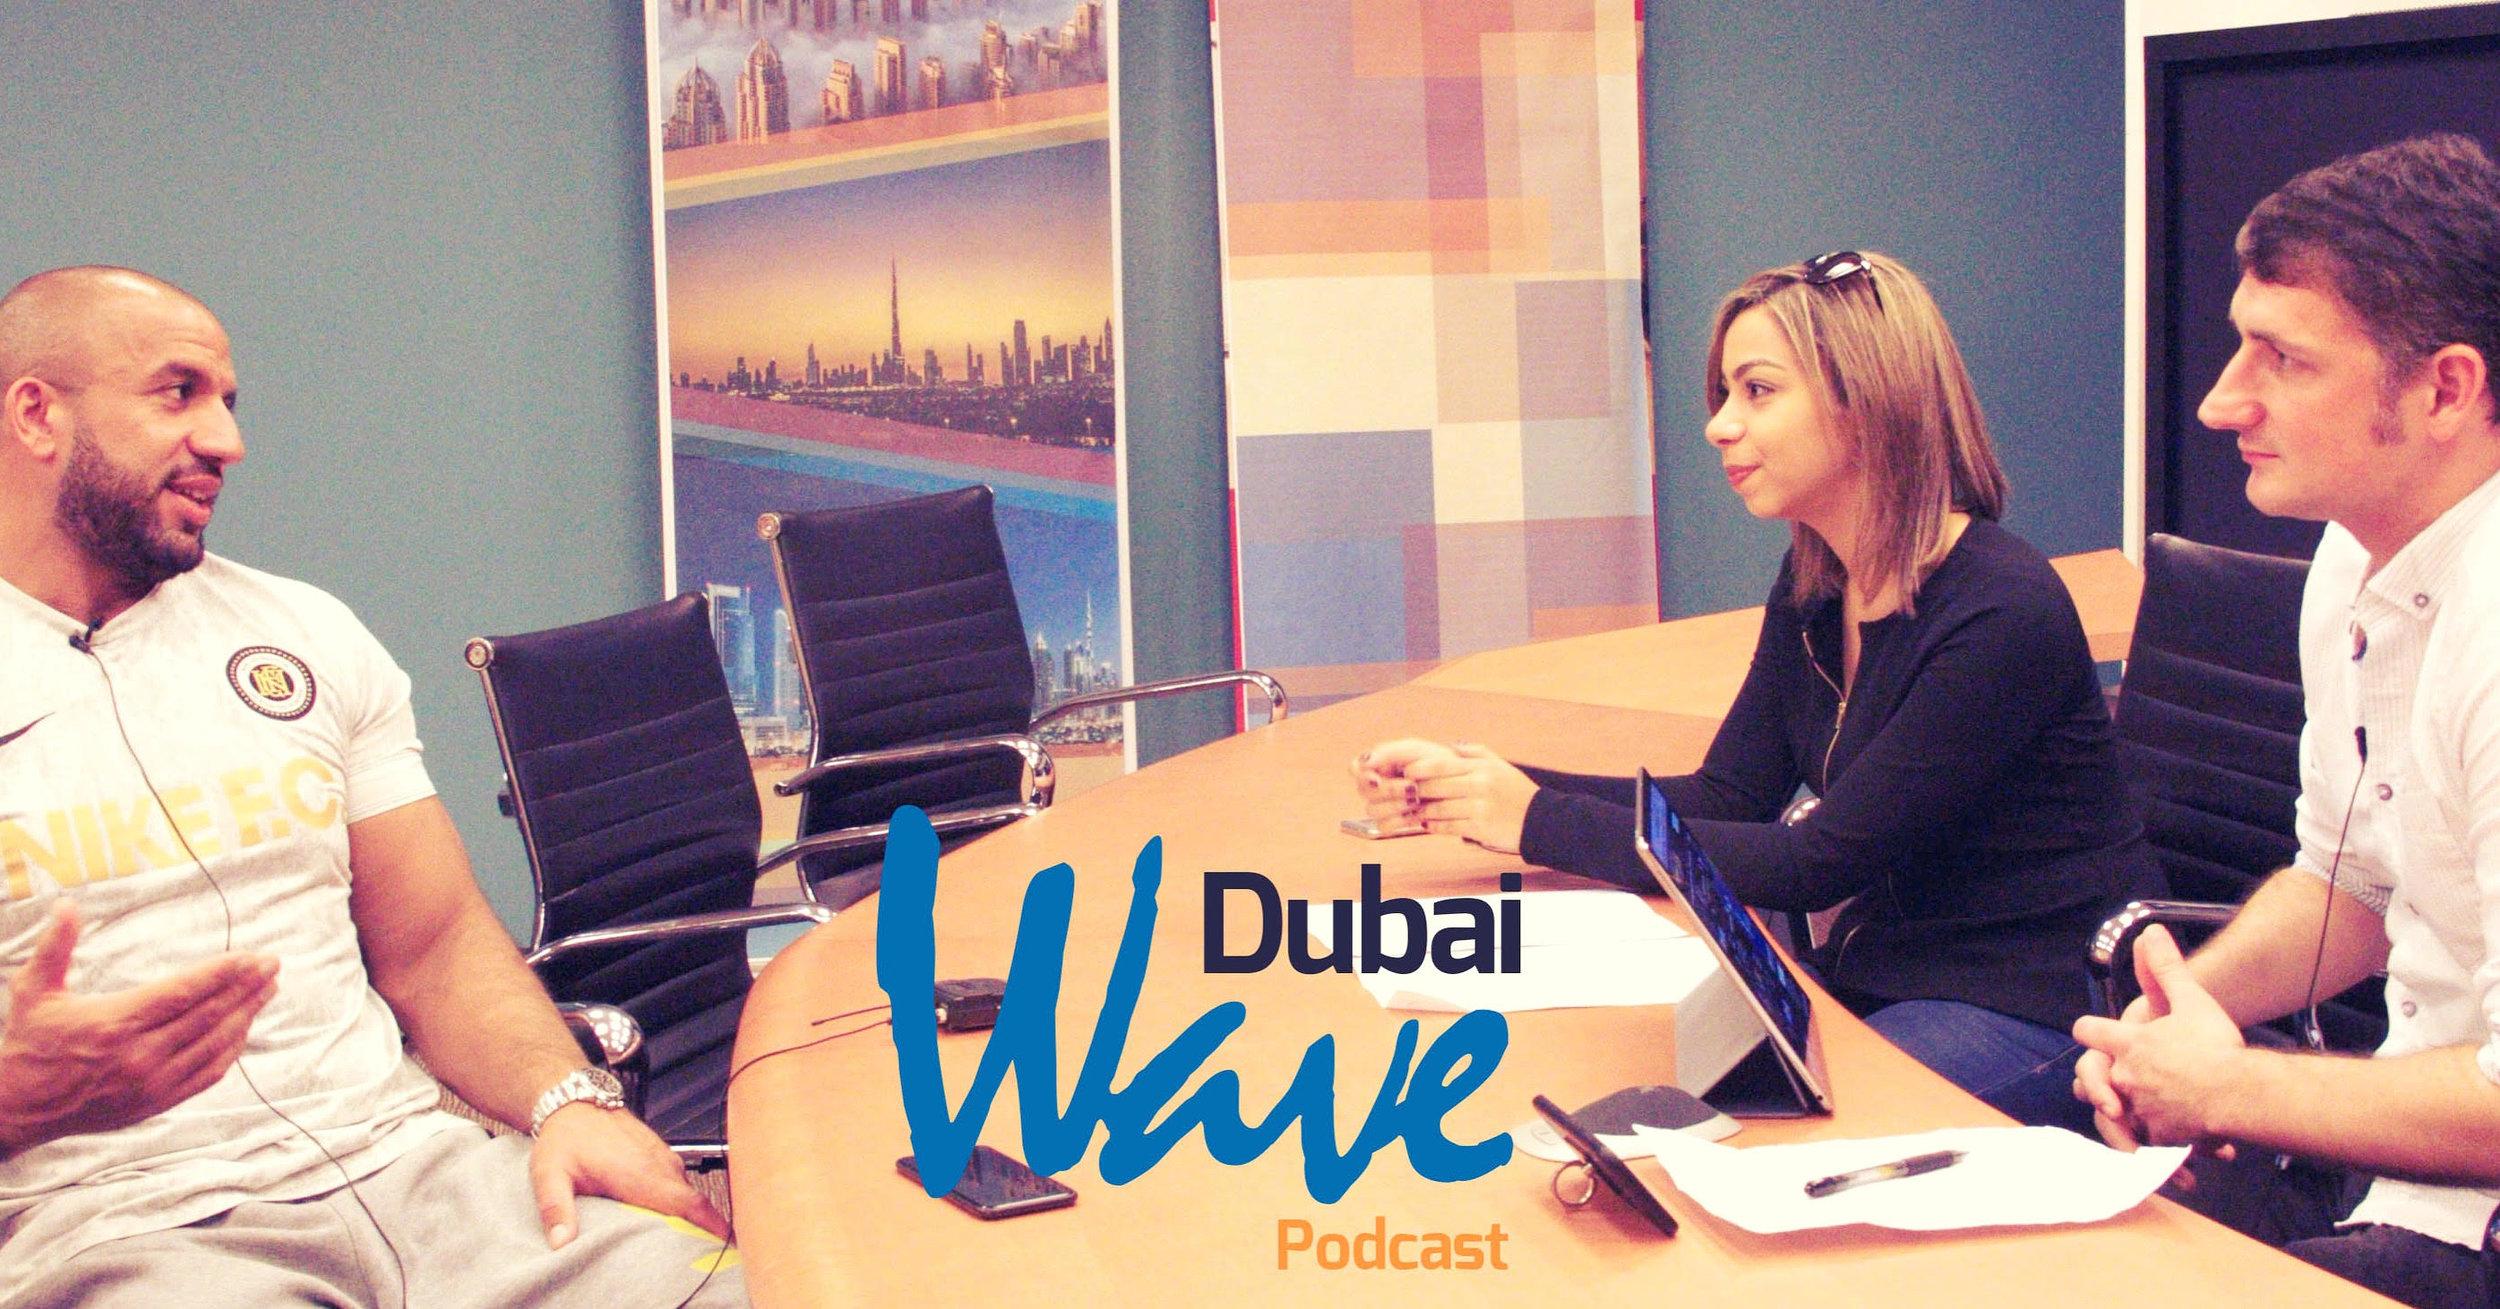 DubaiWave_SpencerStriker_TamKhan.jpg